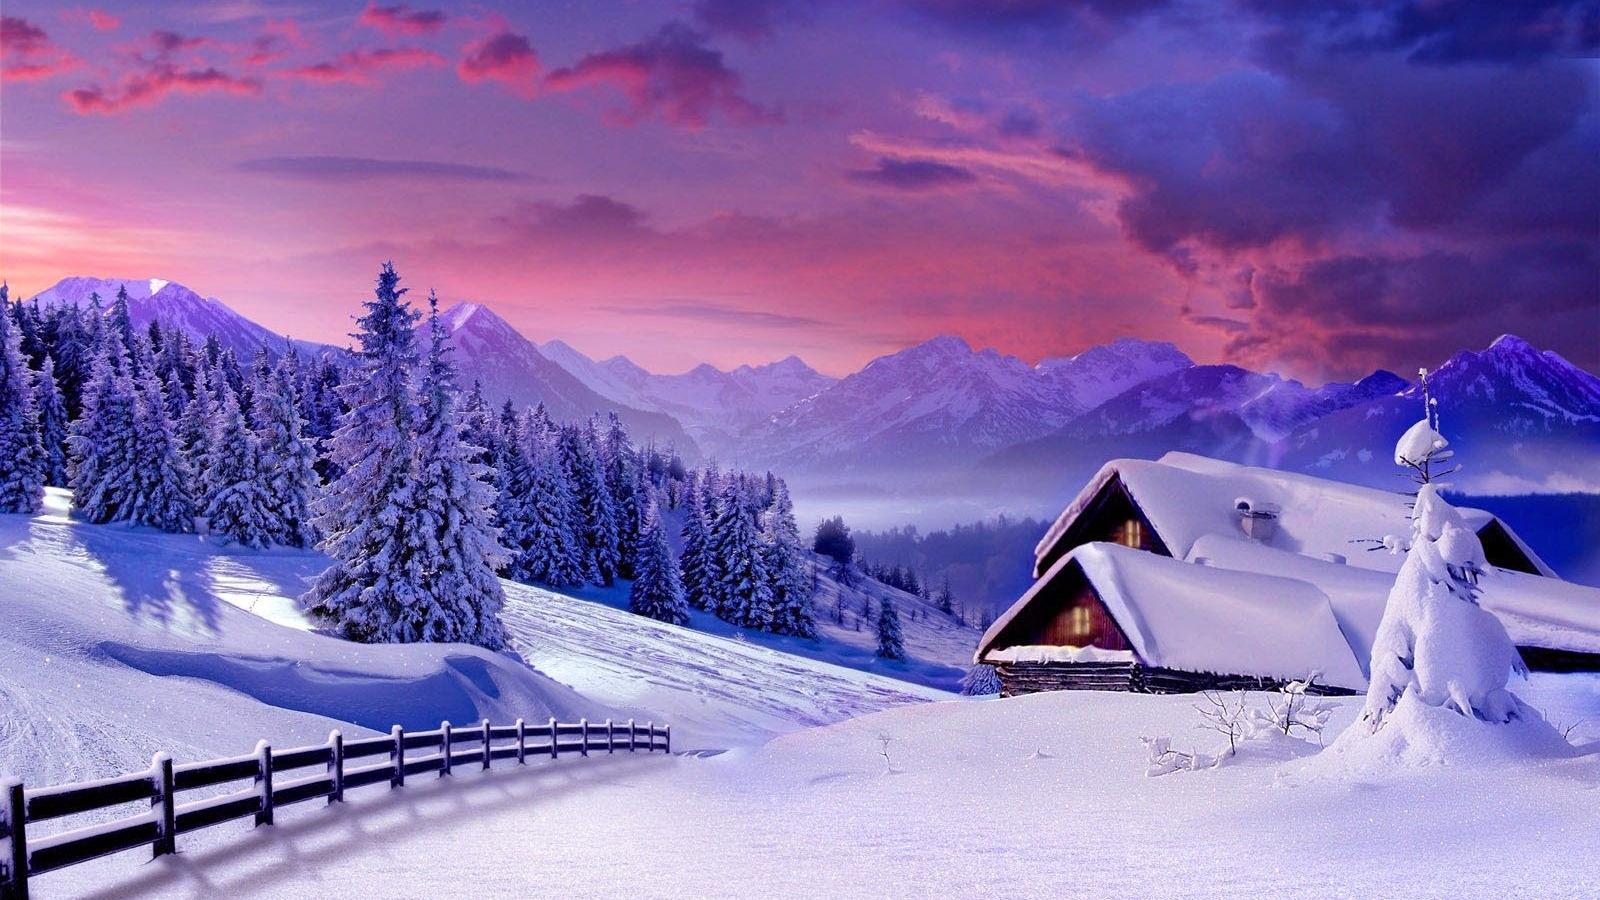 Beautiful Winter Scenery Wallpaper Wallpapers And Pictures Love Beautiful Wallpapers Nature Images Hd 1600x900 Download Hd Wallpaper Wallpapertip